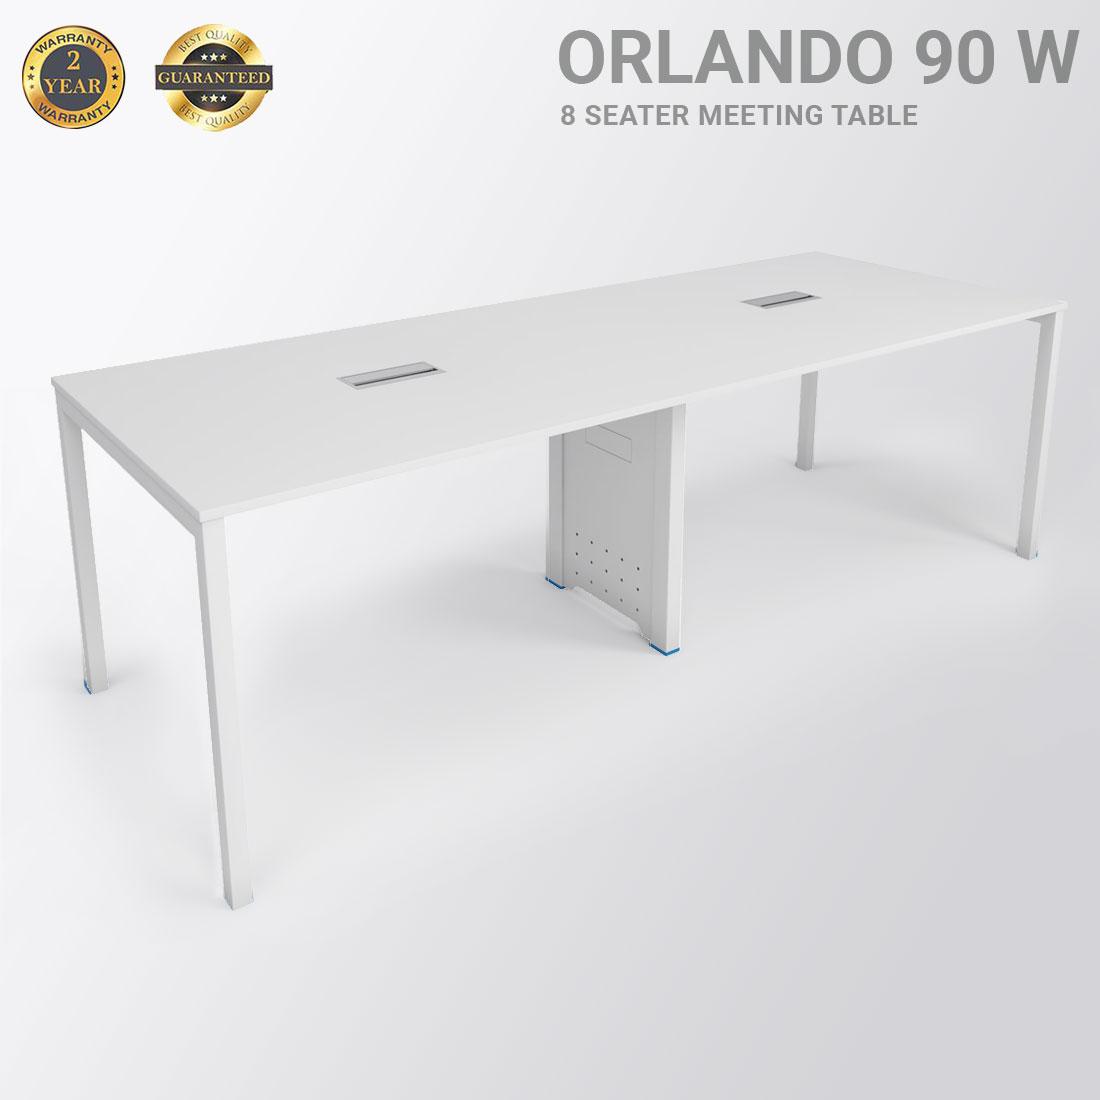 Orlando W 8 Seater